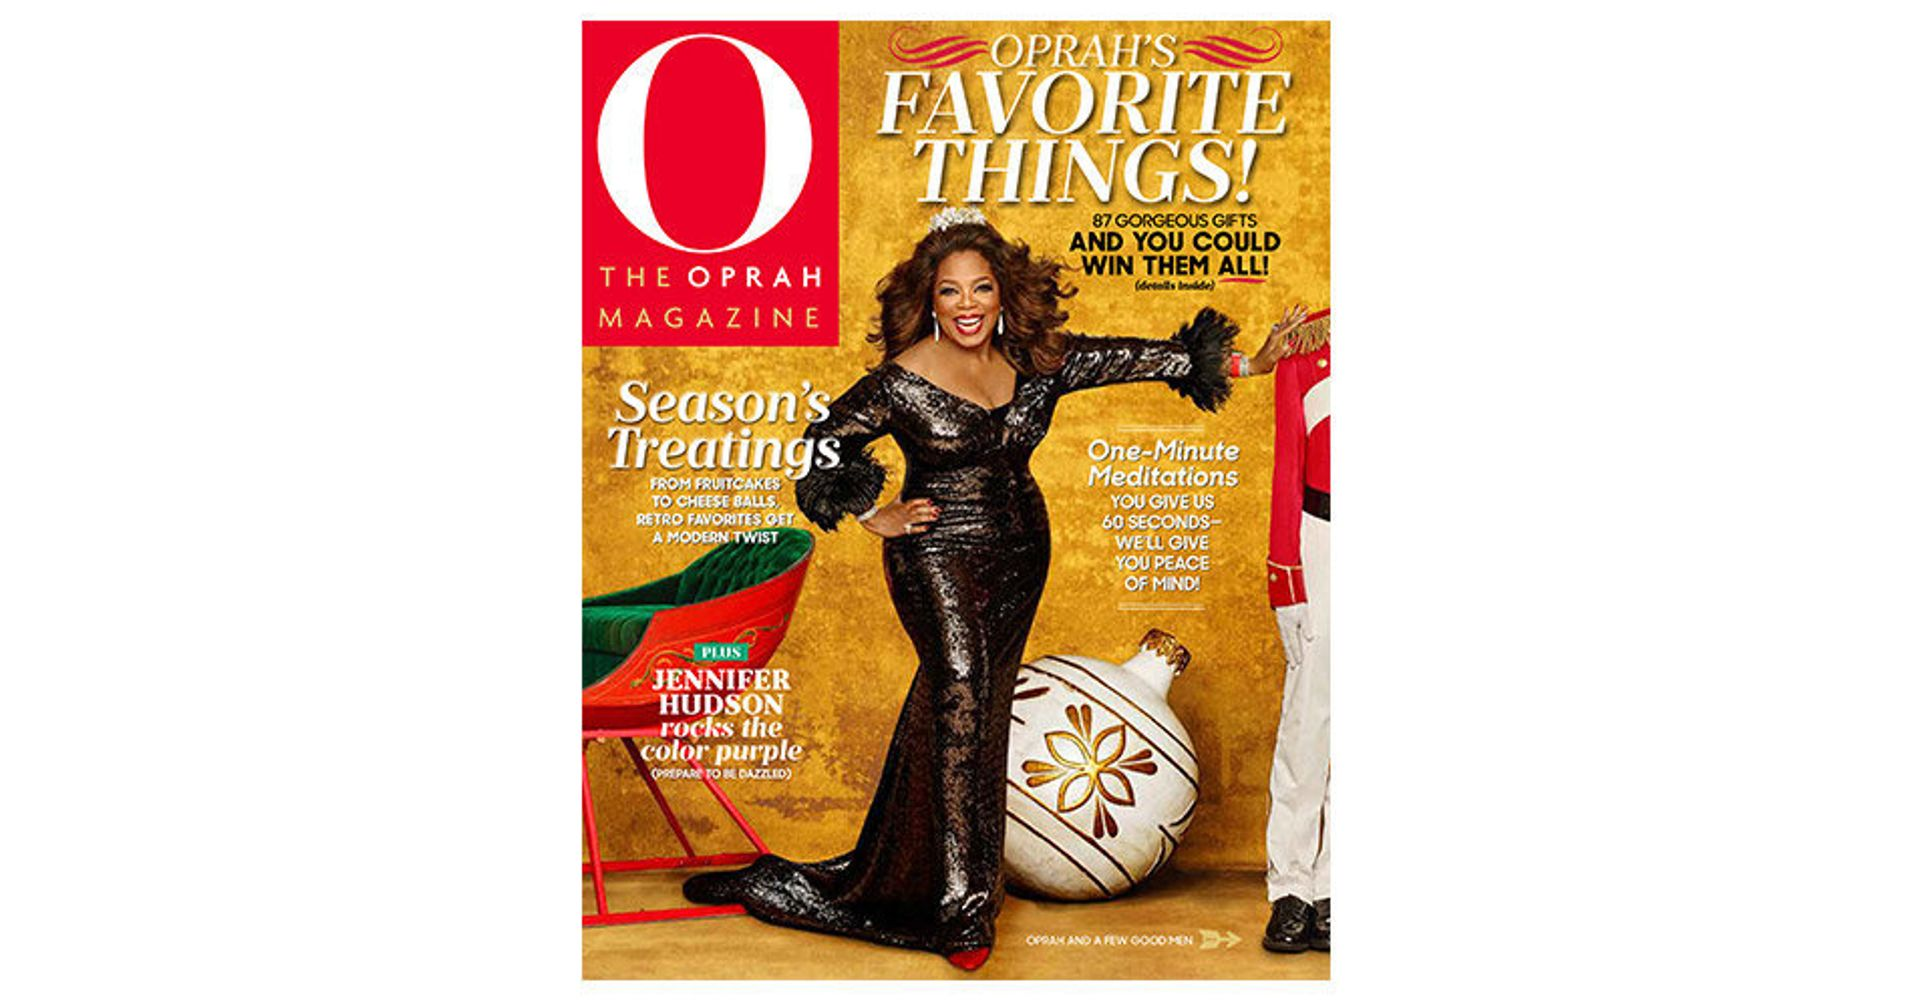 bd39e34ab8 Oprah s Favorite Things -- 2015 Edition!